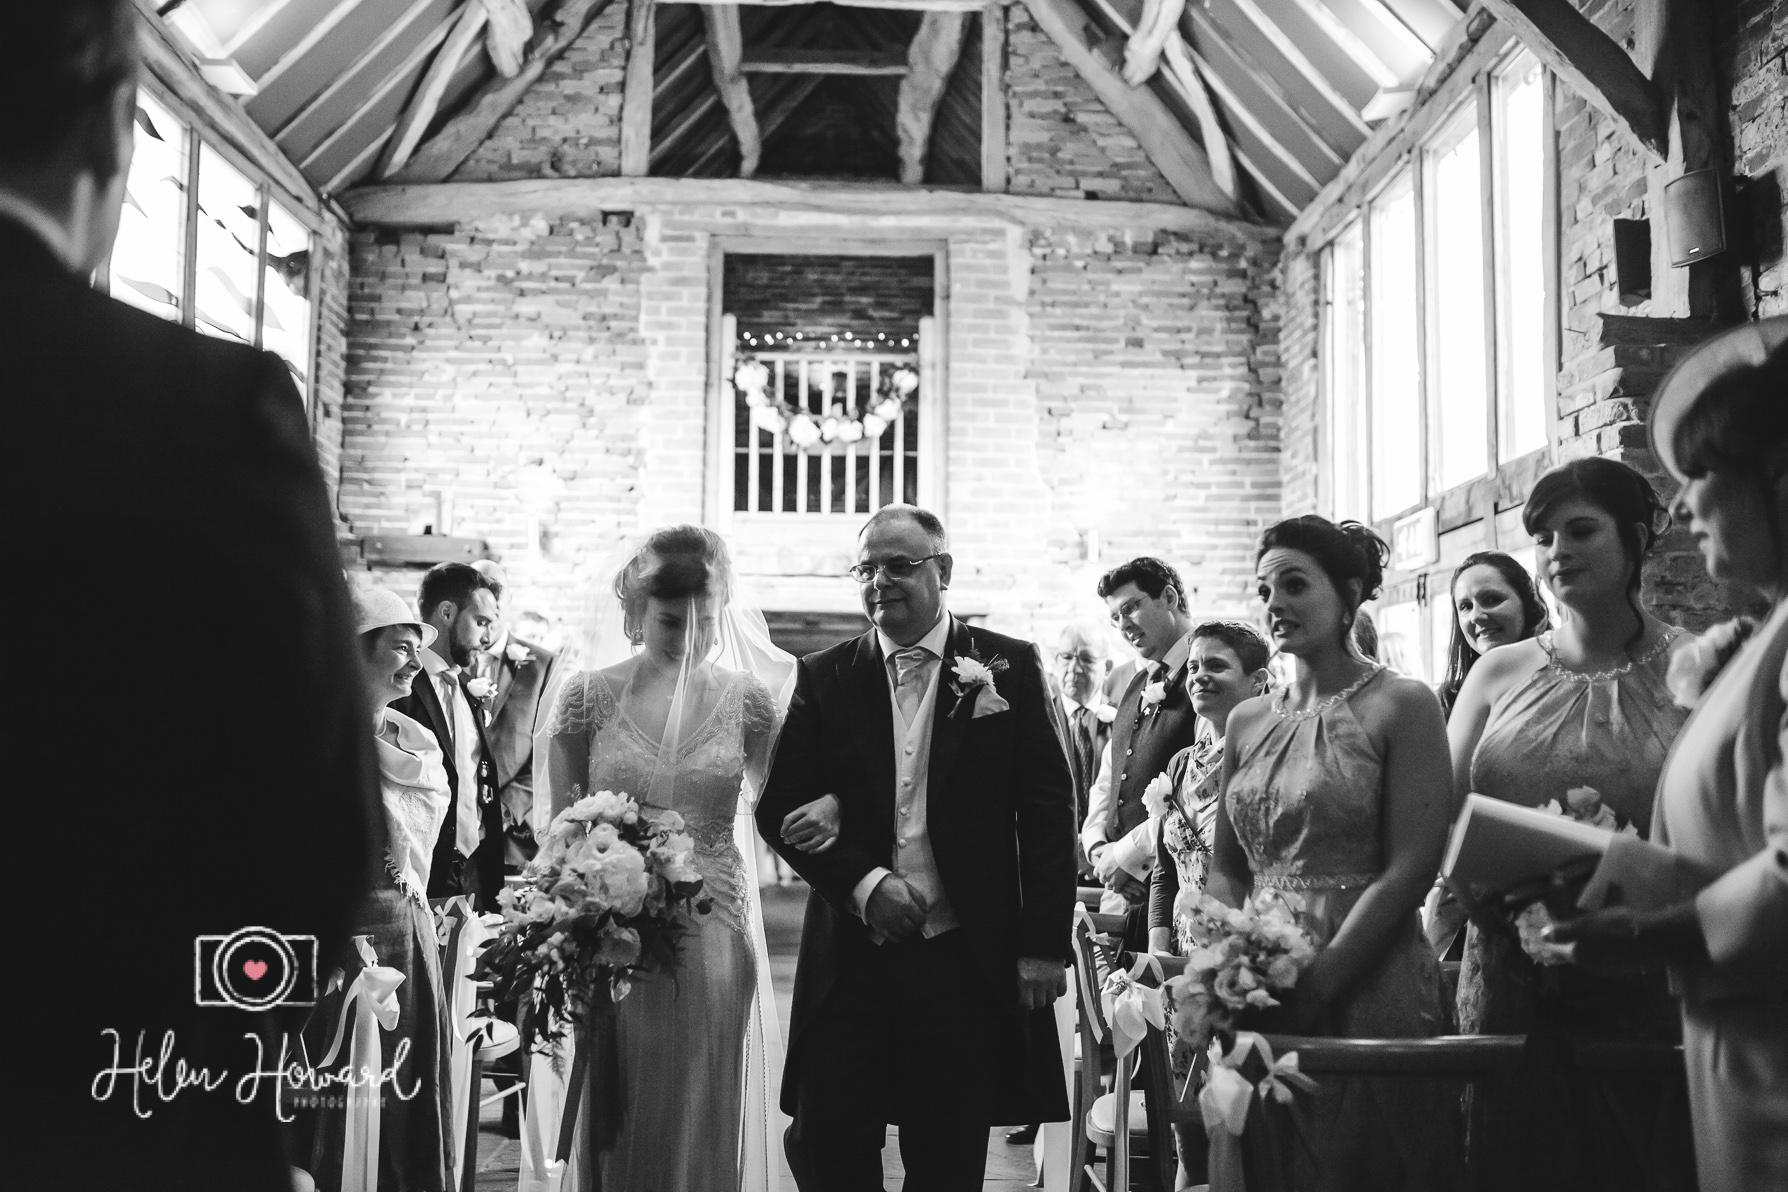 Helen Howard Photography Packington Moor Wedding-61.jpg